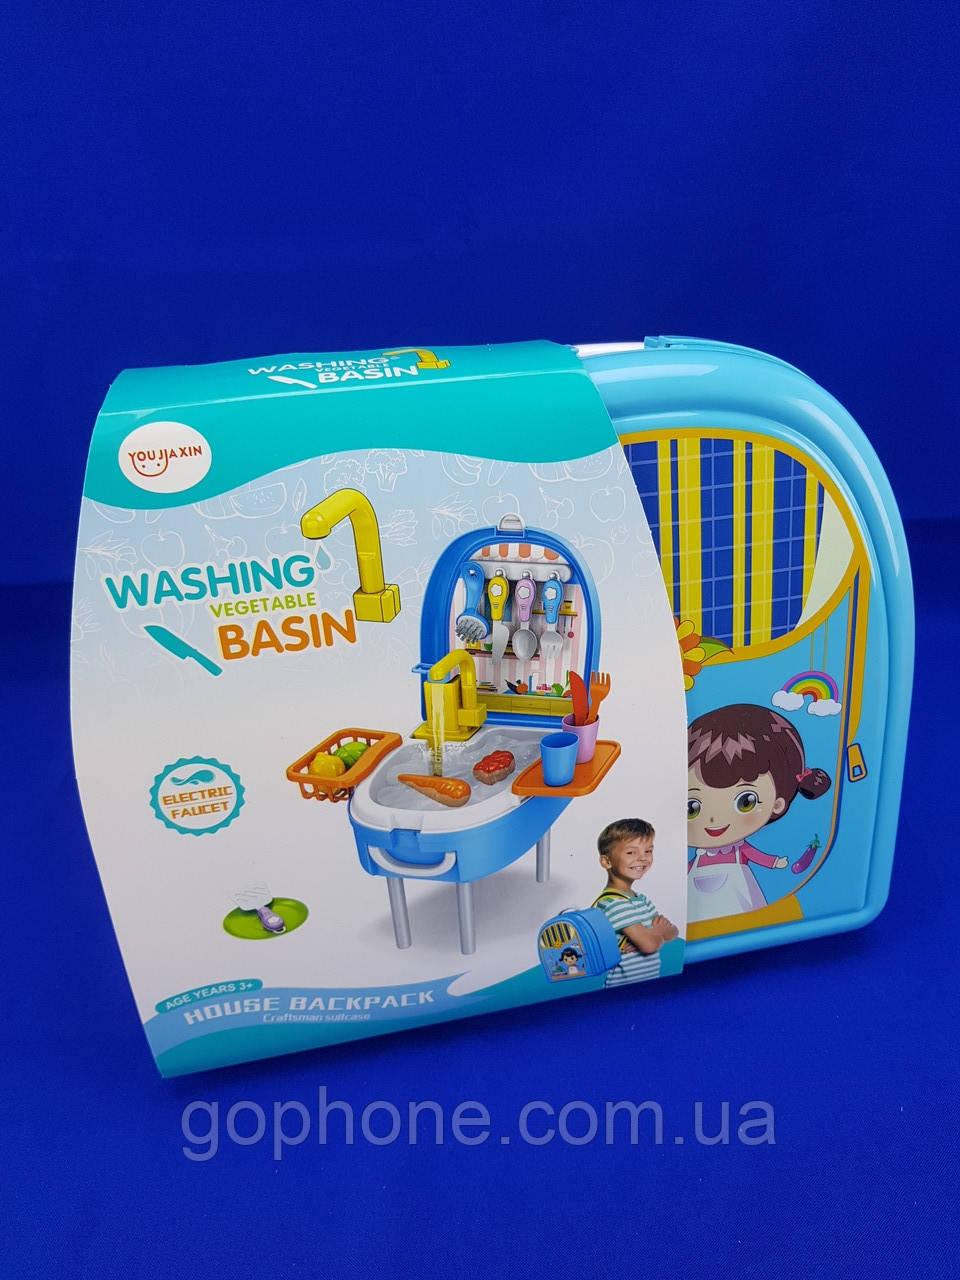 Игровой набор WASHING VEGETABLE BASIN Кухня в форме рюкзака